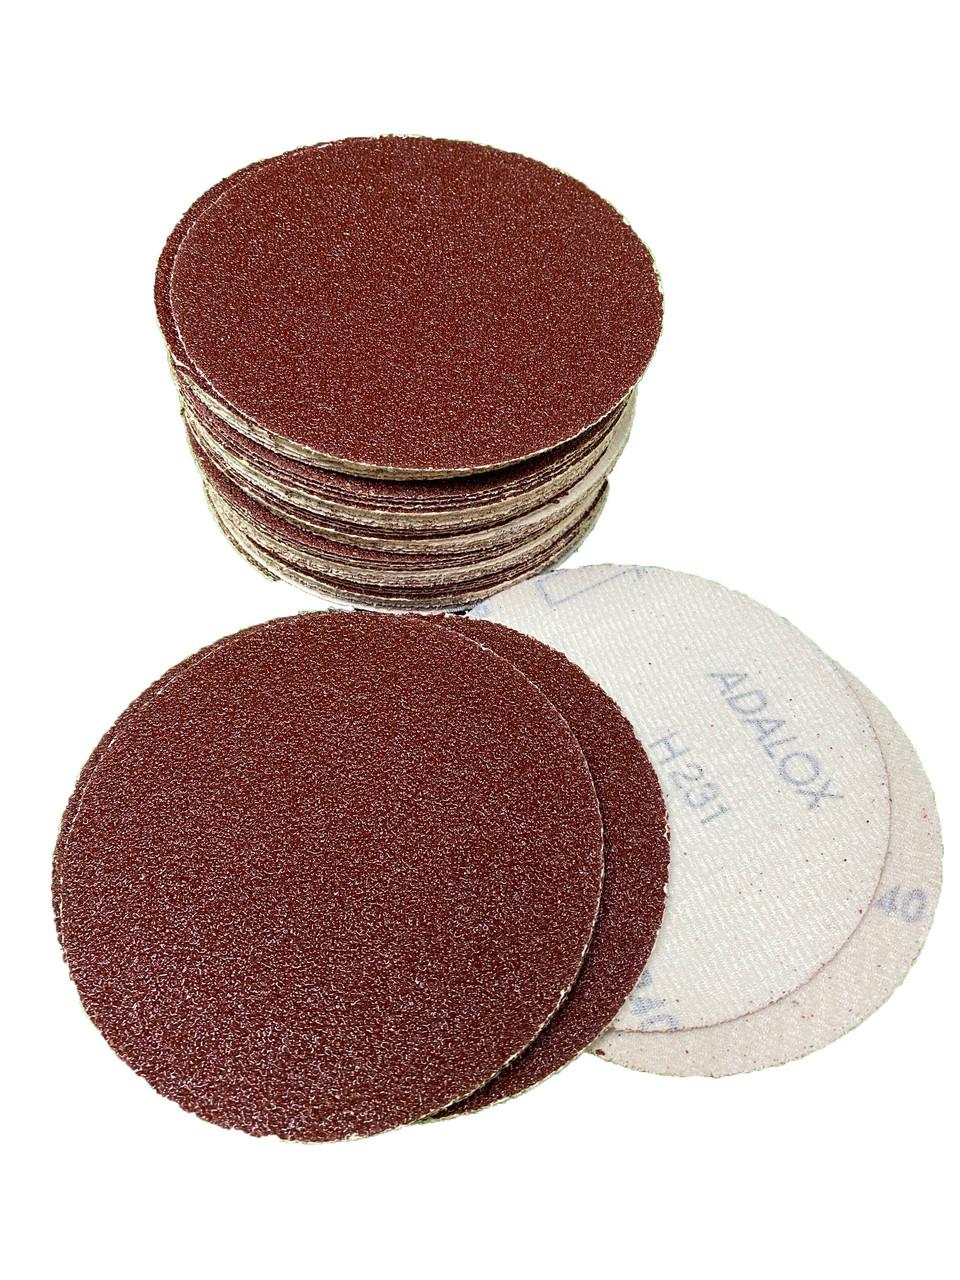 "125mm  sanding discs 5"" Box of 50 discs 40grit NORTON"